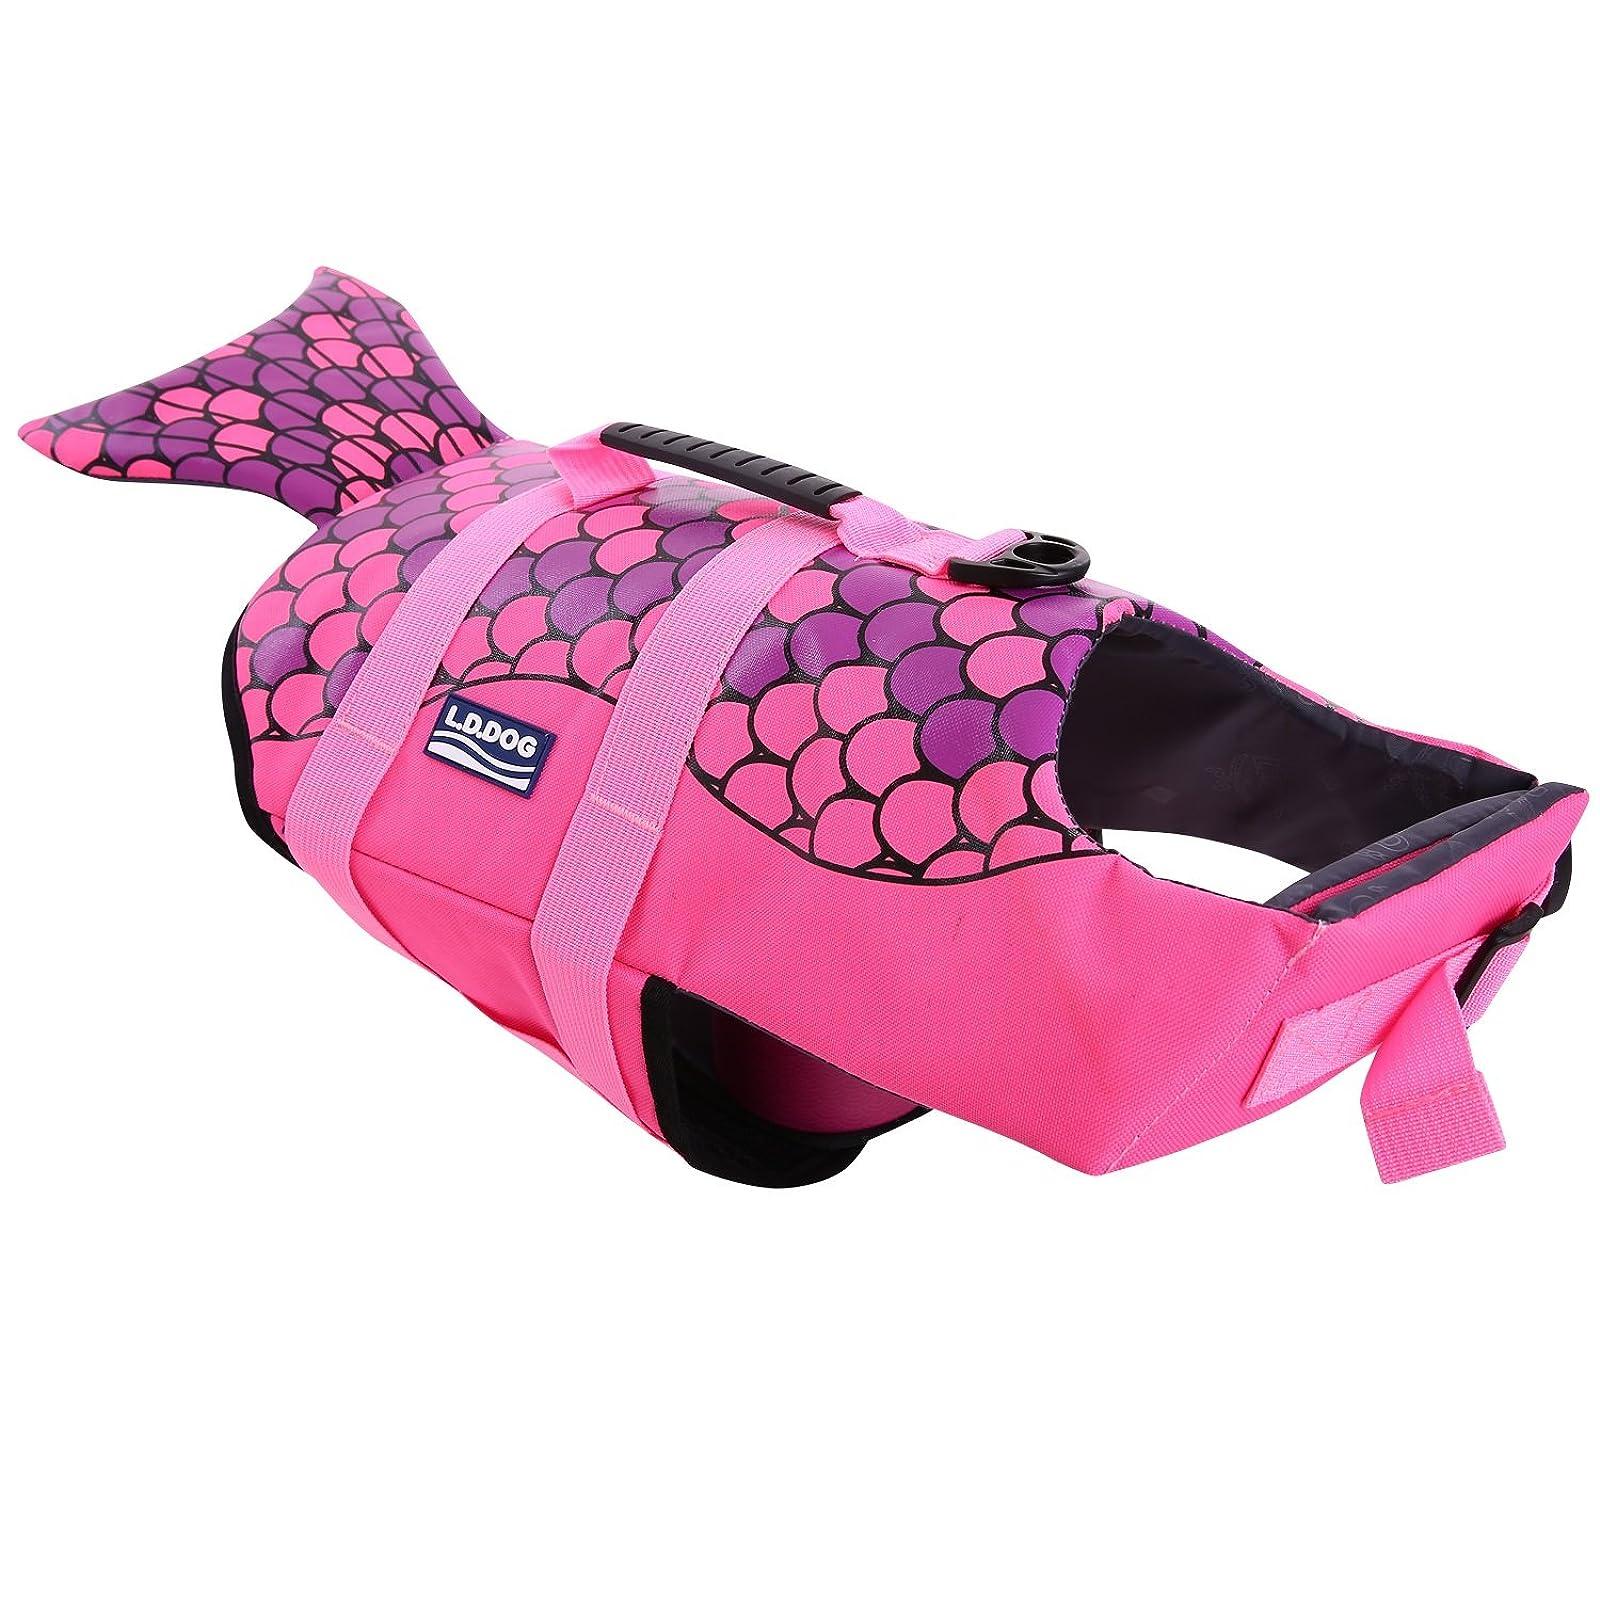 Queenmore Dog Life Jacket Ripstop Lifesaver Coat - 1